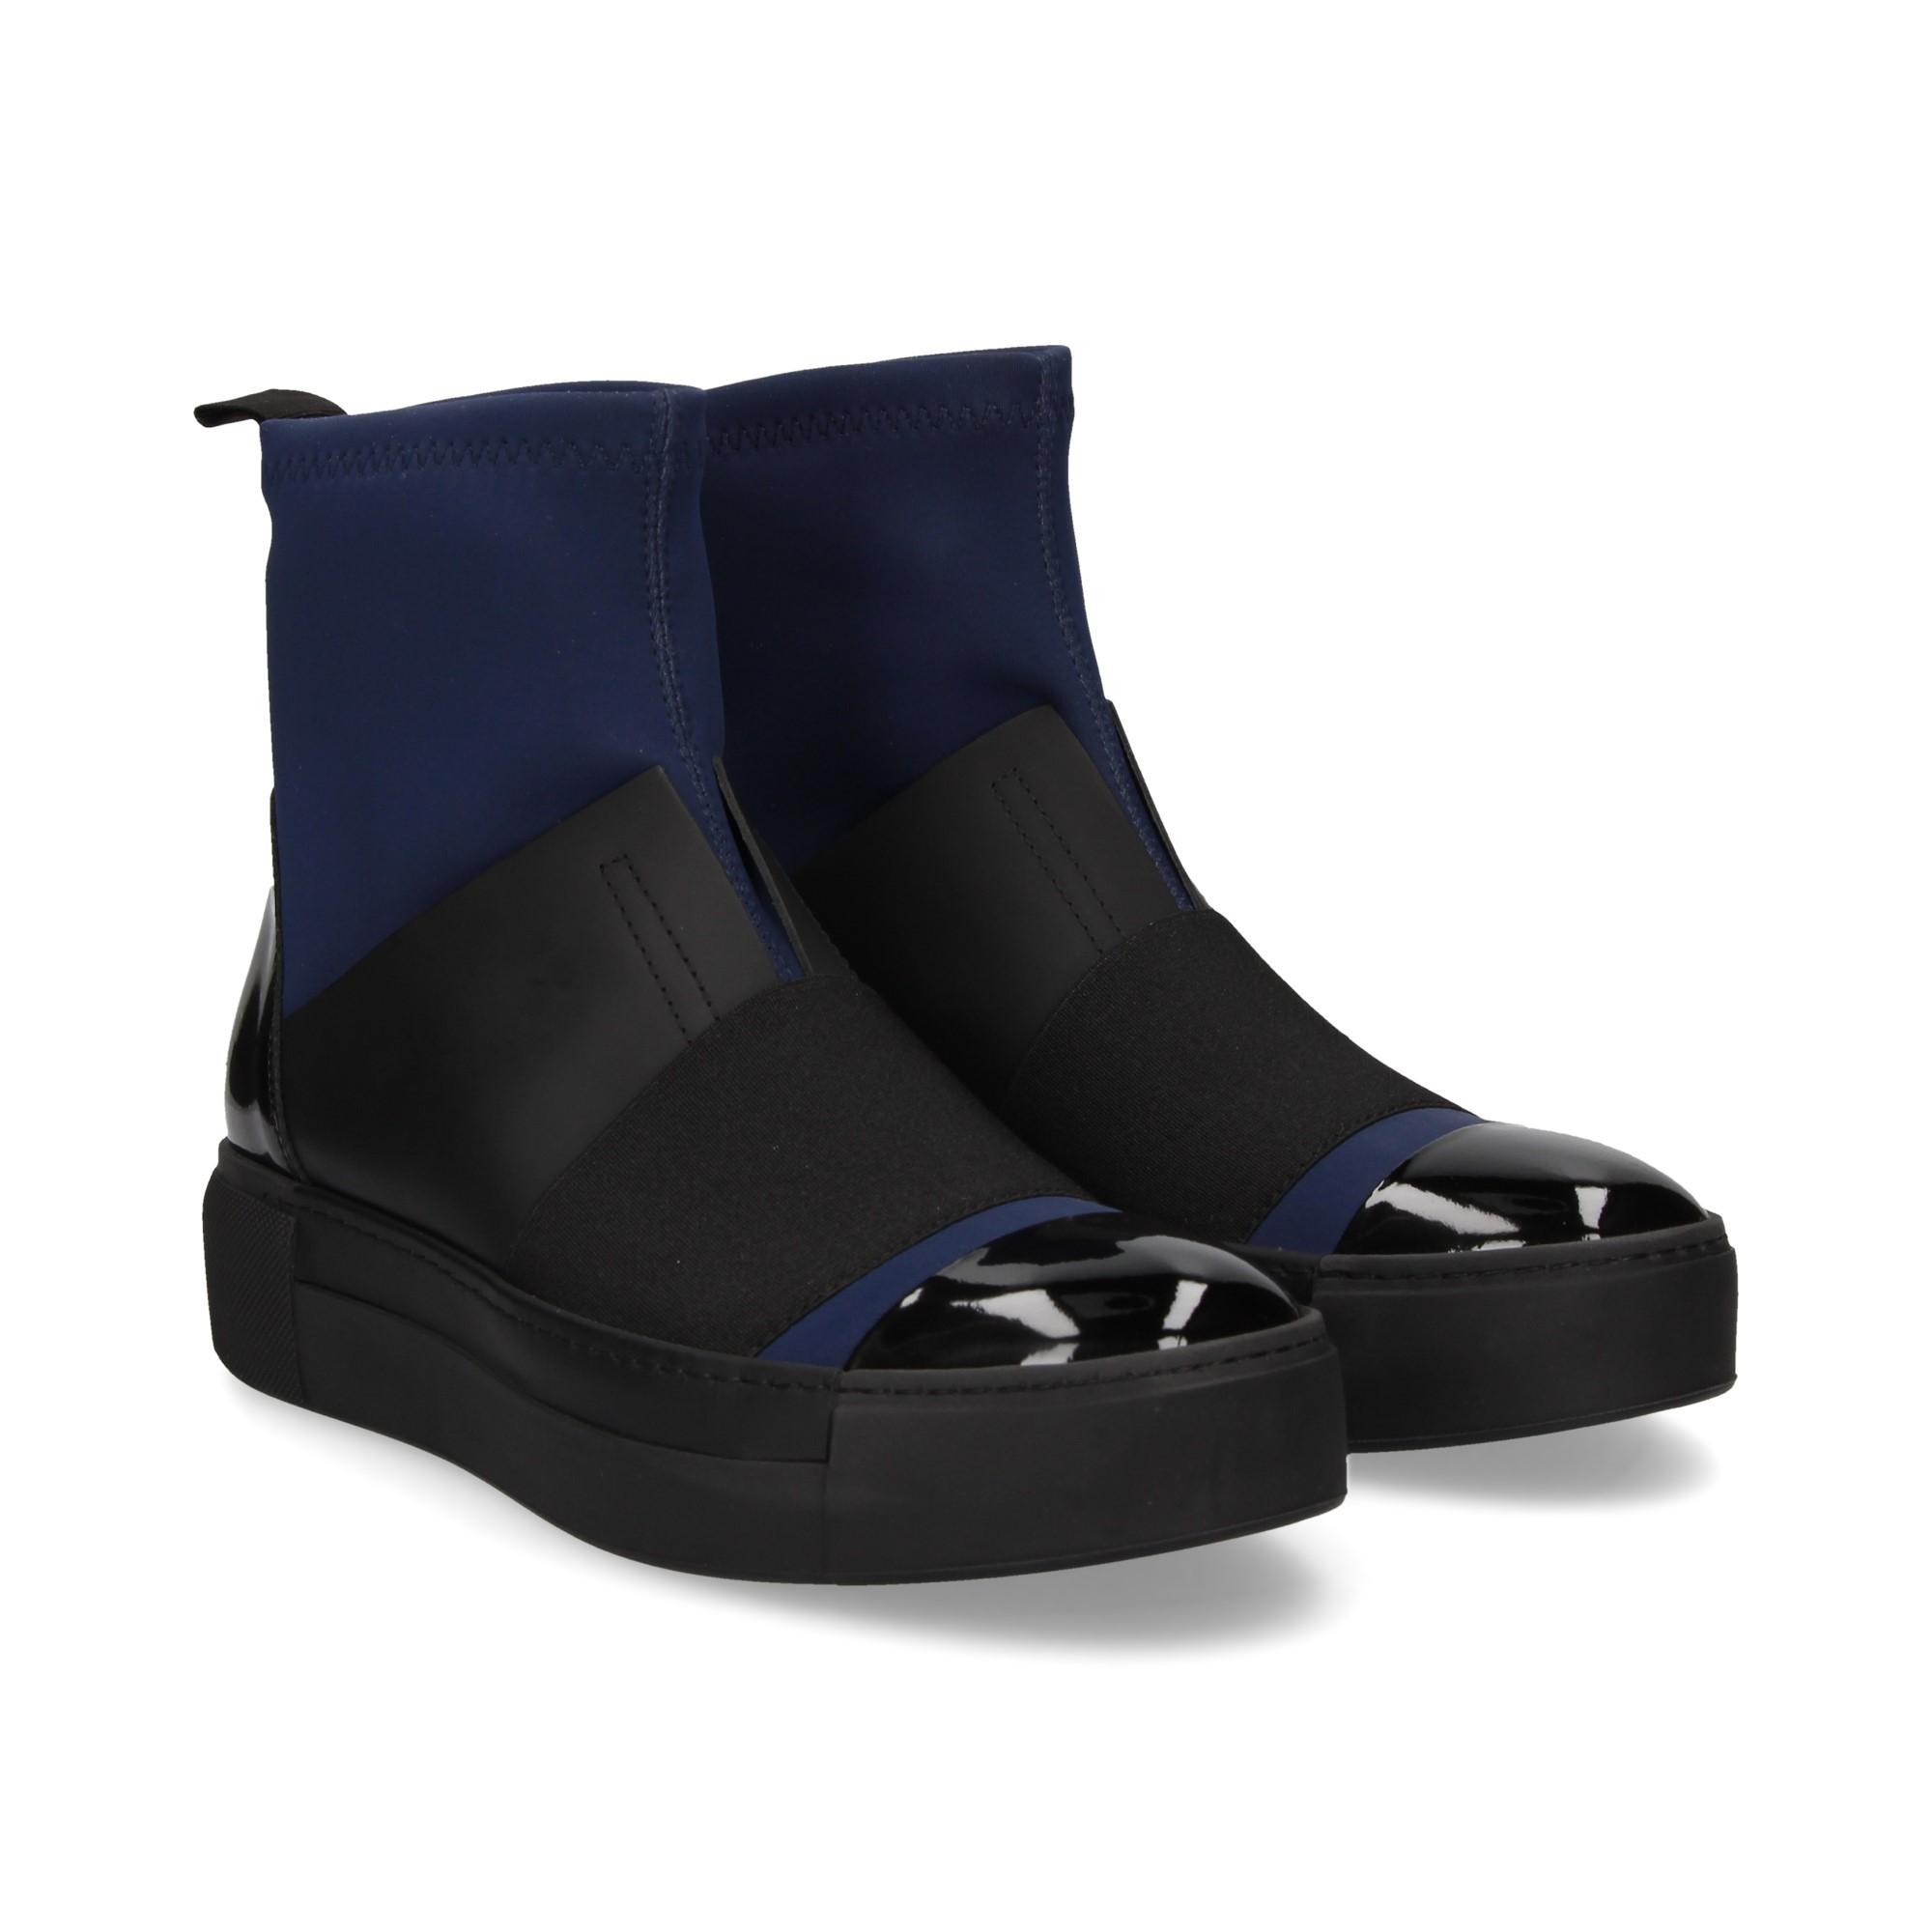 botin-neopreno-punta-elast-bicolor-azul